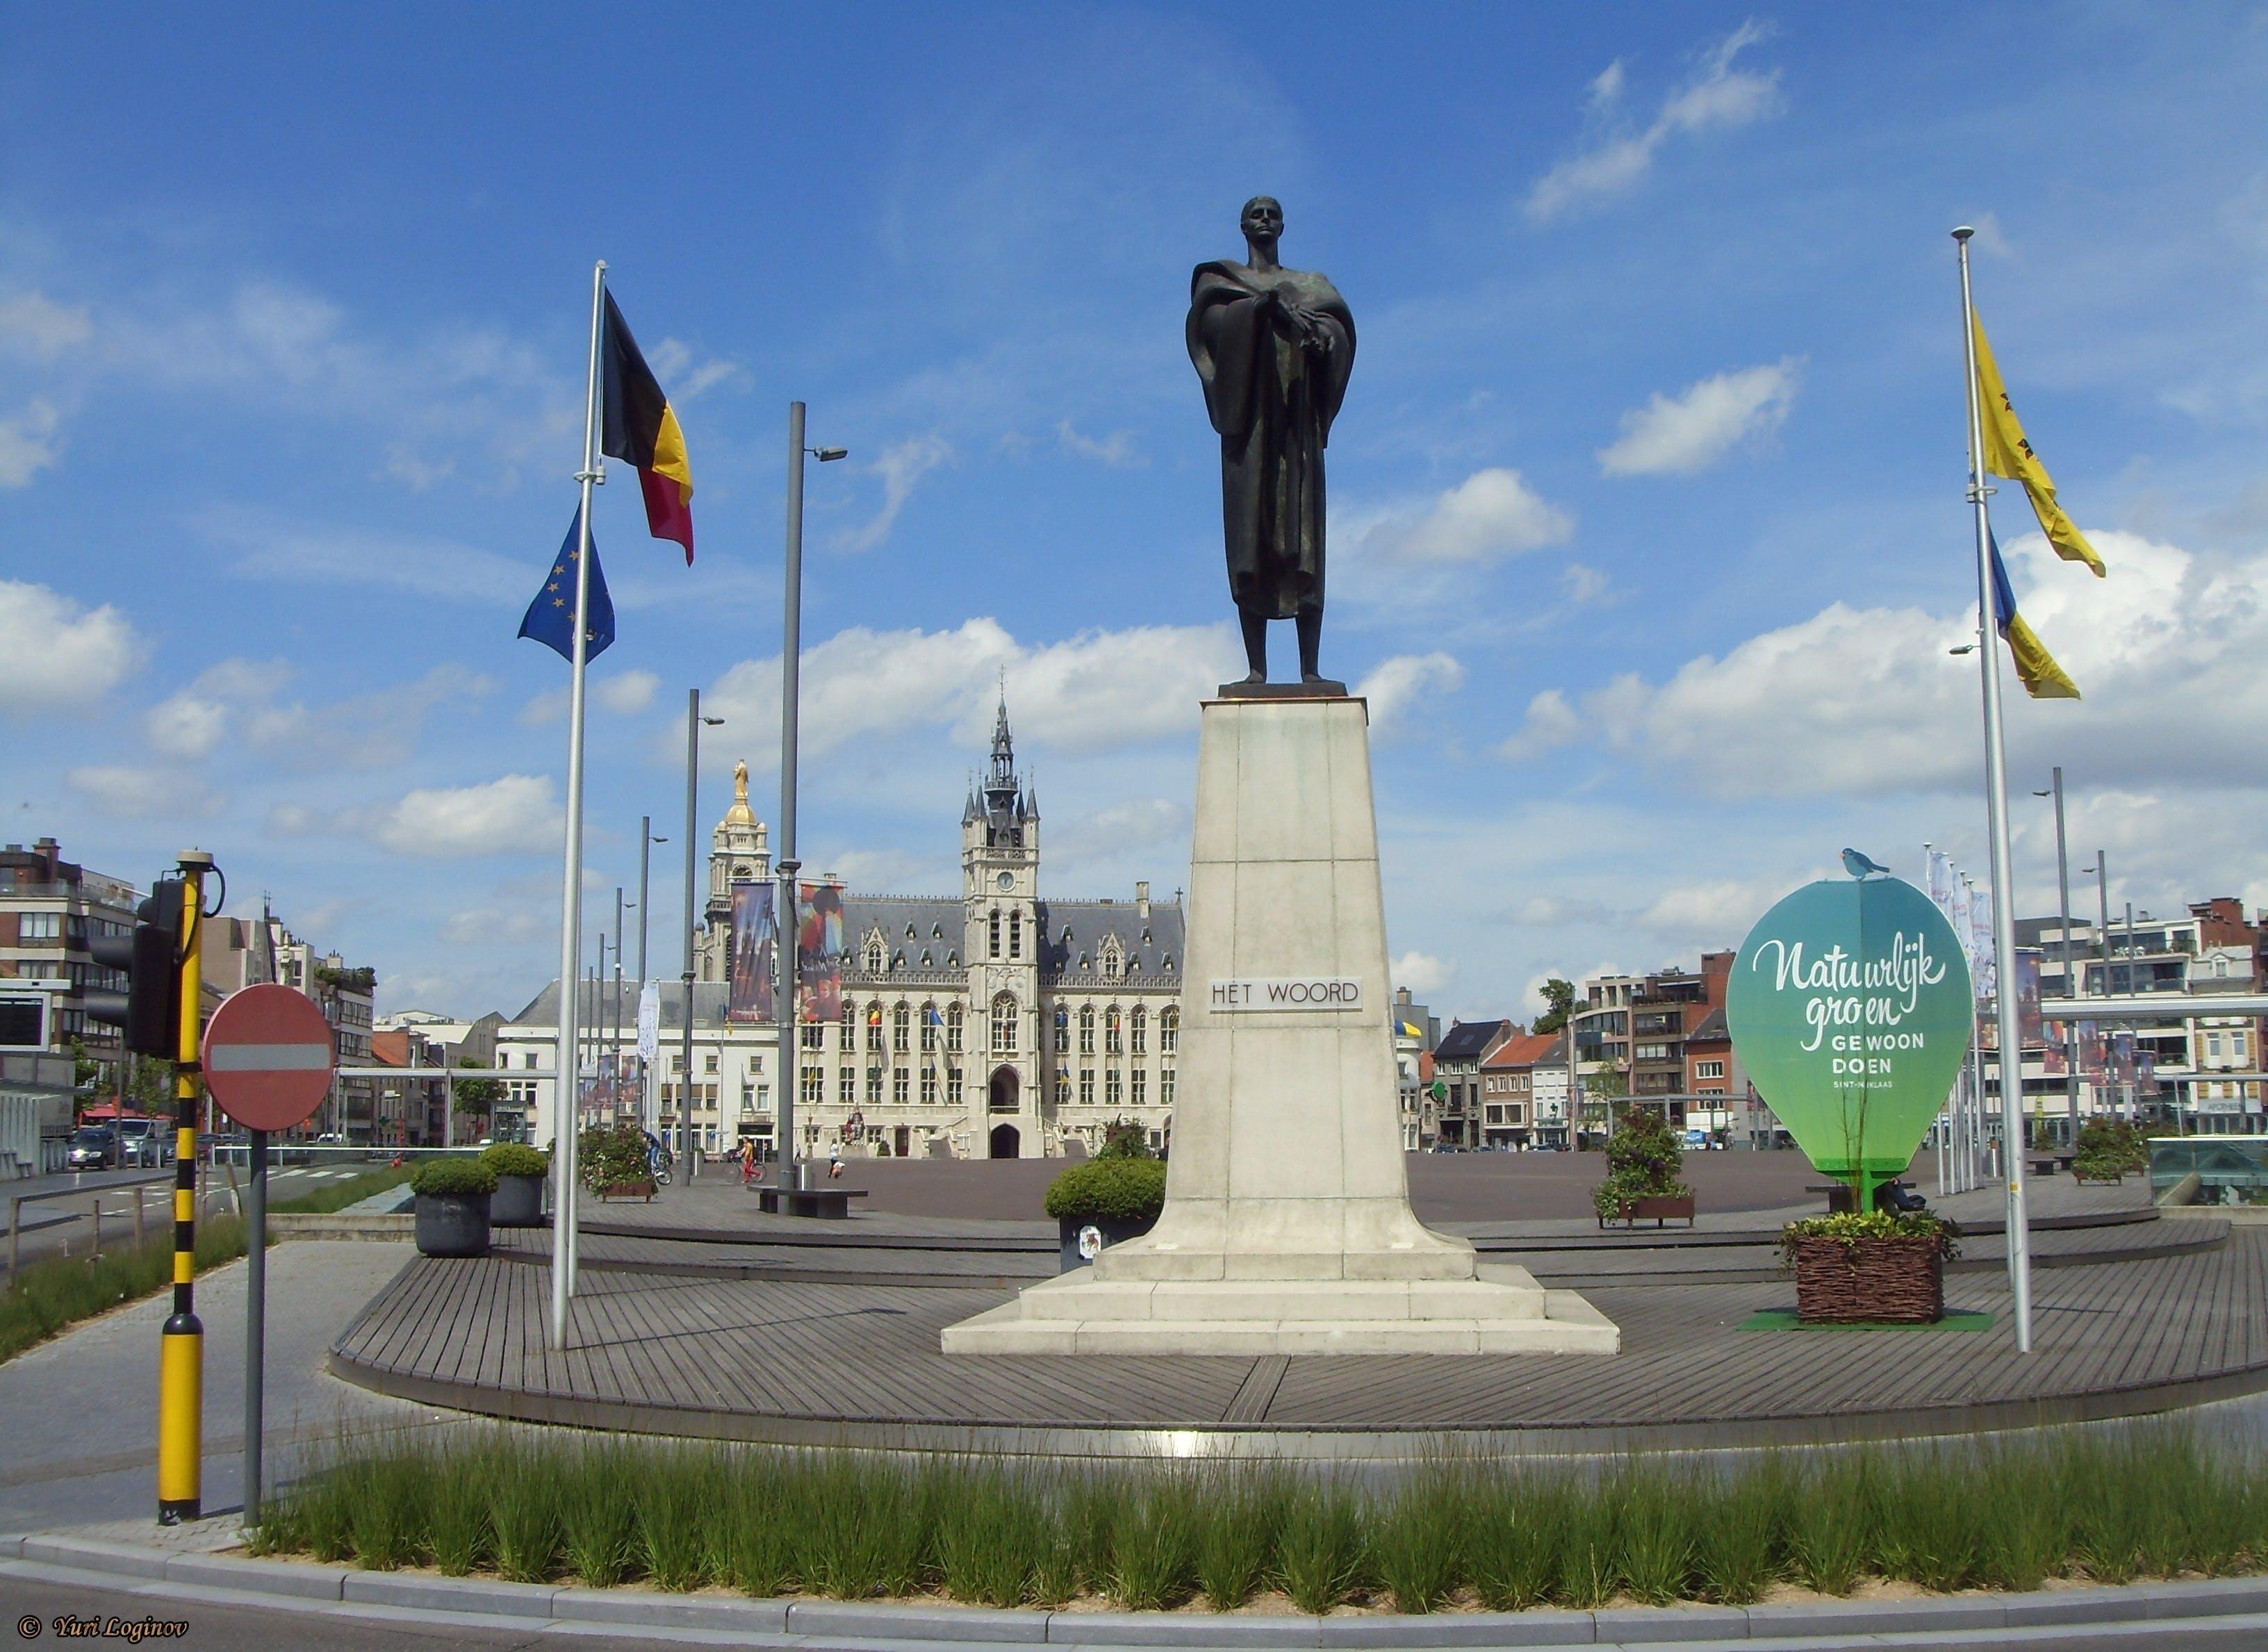 Free stock photo of Belgium, grote markt, België, Sint-Niklaas